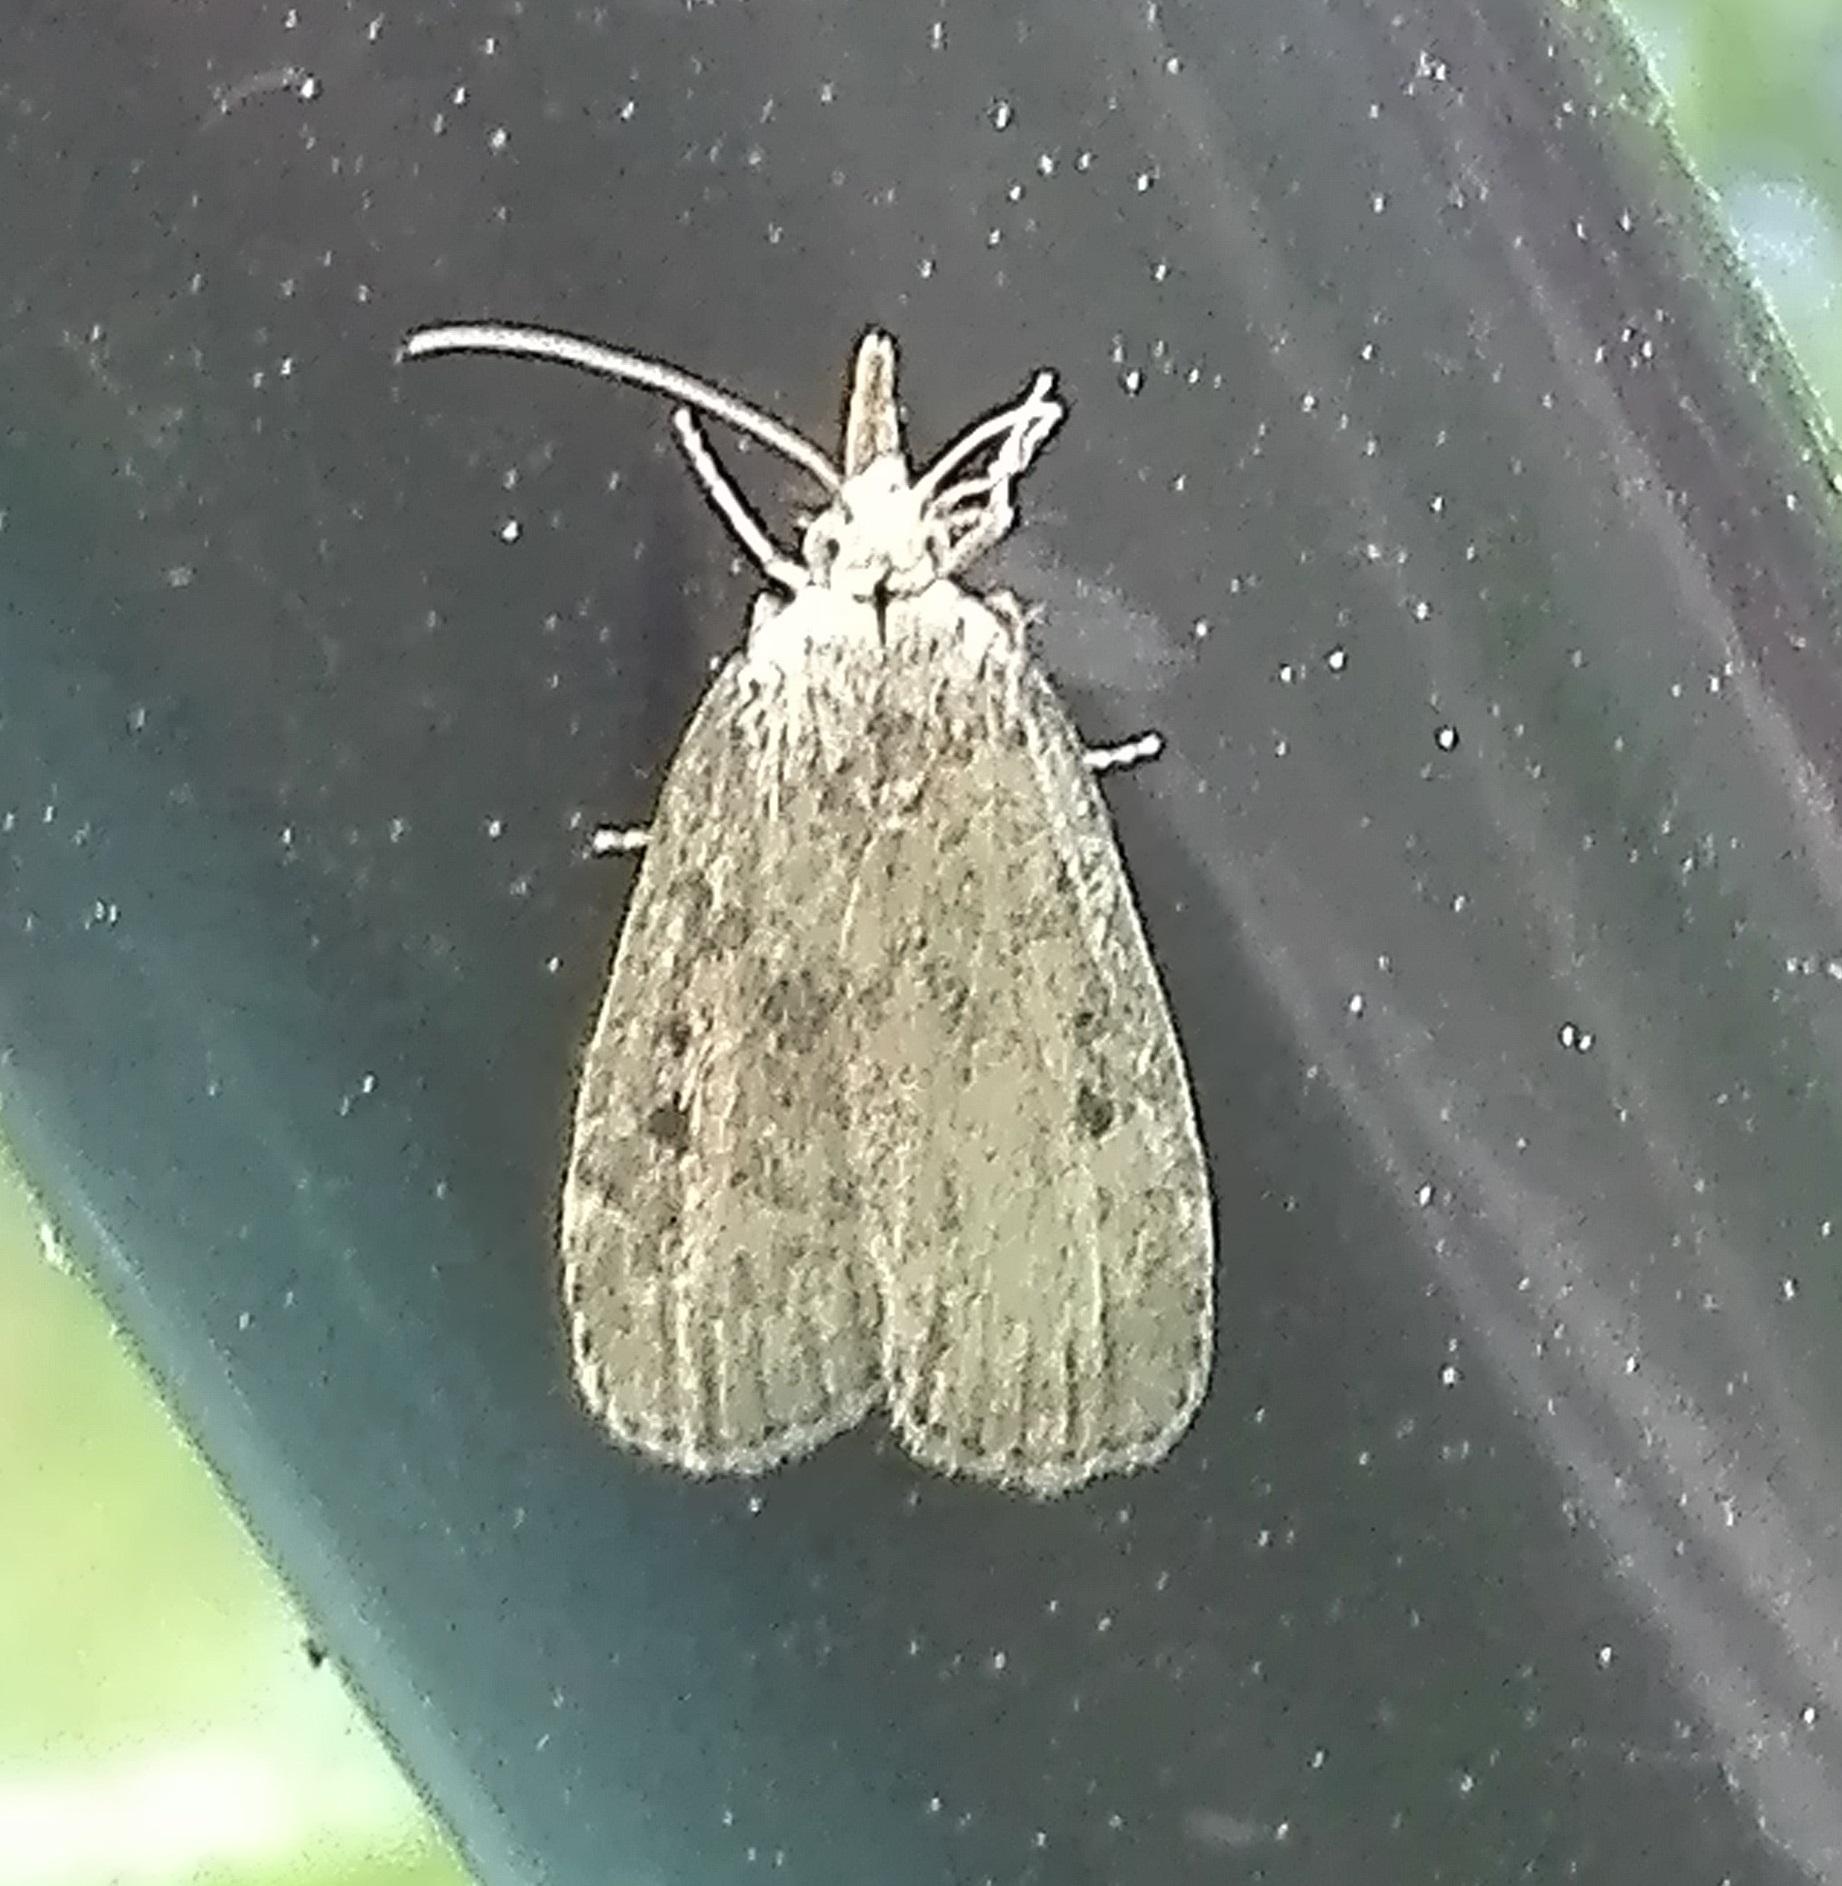 #491 Bee Moth (Aphomia sociella)